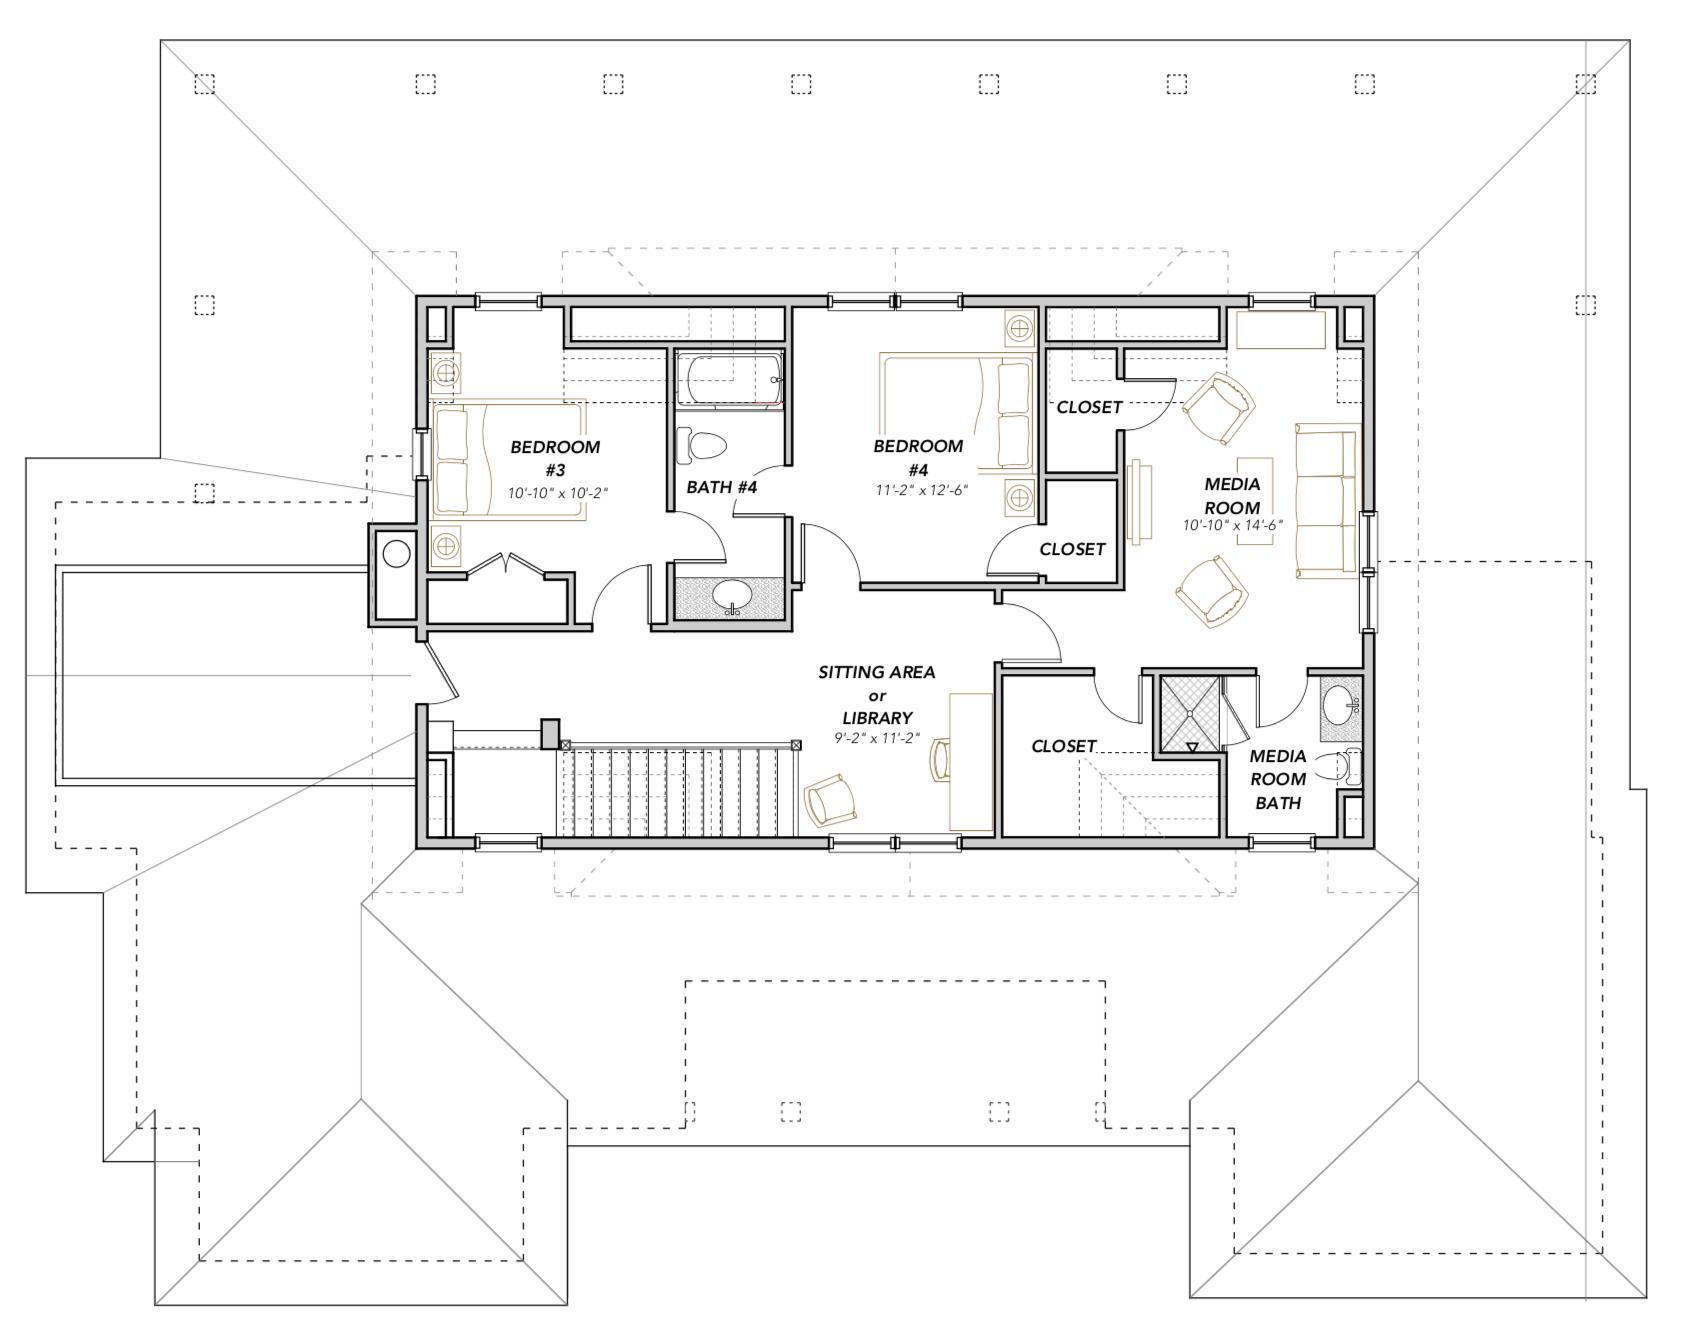 American White Ibis Home Plan — Flatfish Island Designs ... on mill creek floor plans, community architecture, community bathroom floor plans,